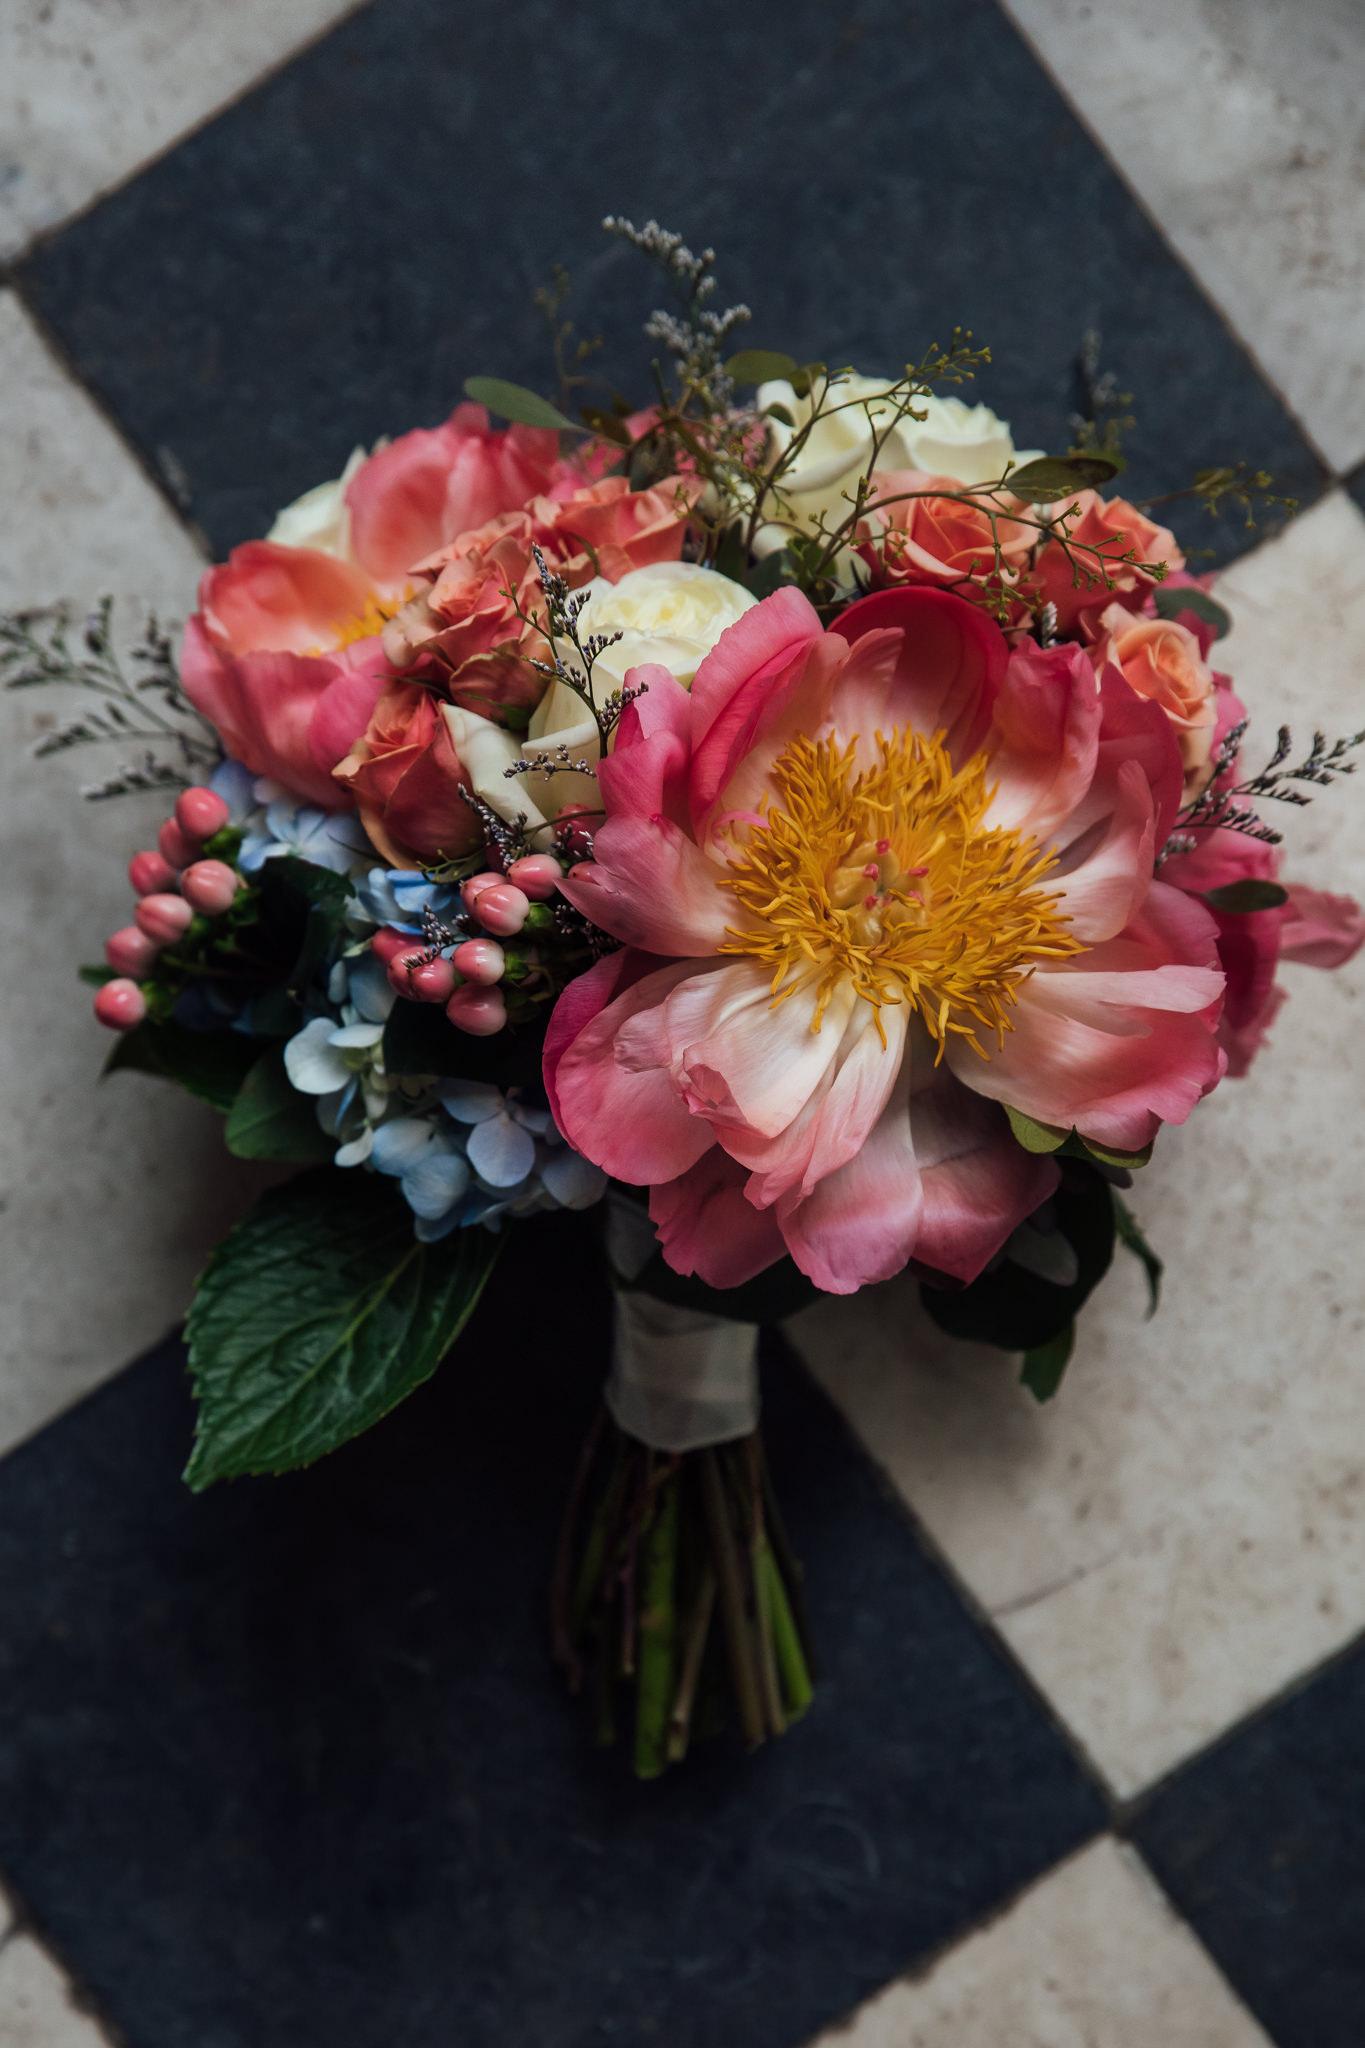 woodruff-fontaine-wedding-venue-memphis-thewarmtharoundyou-brenda-taylor-2.jpg